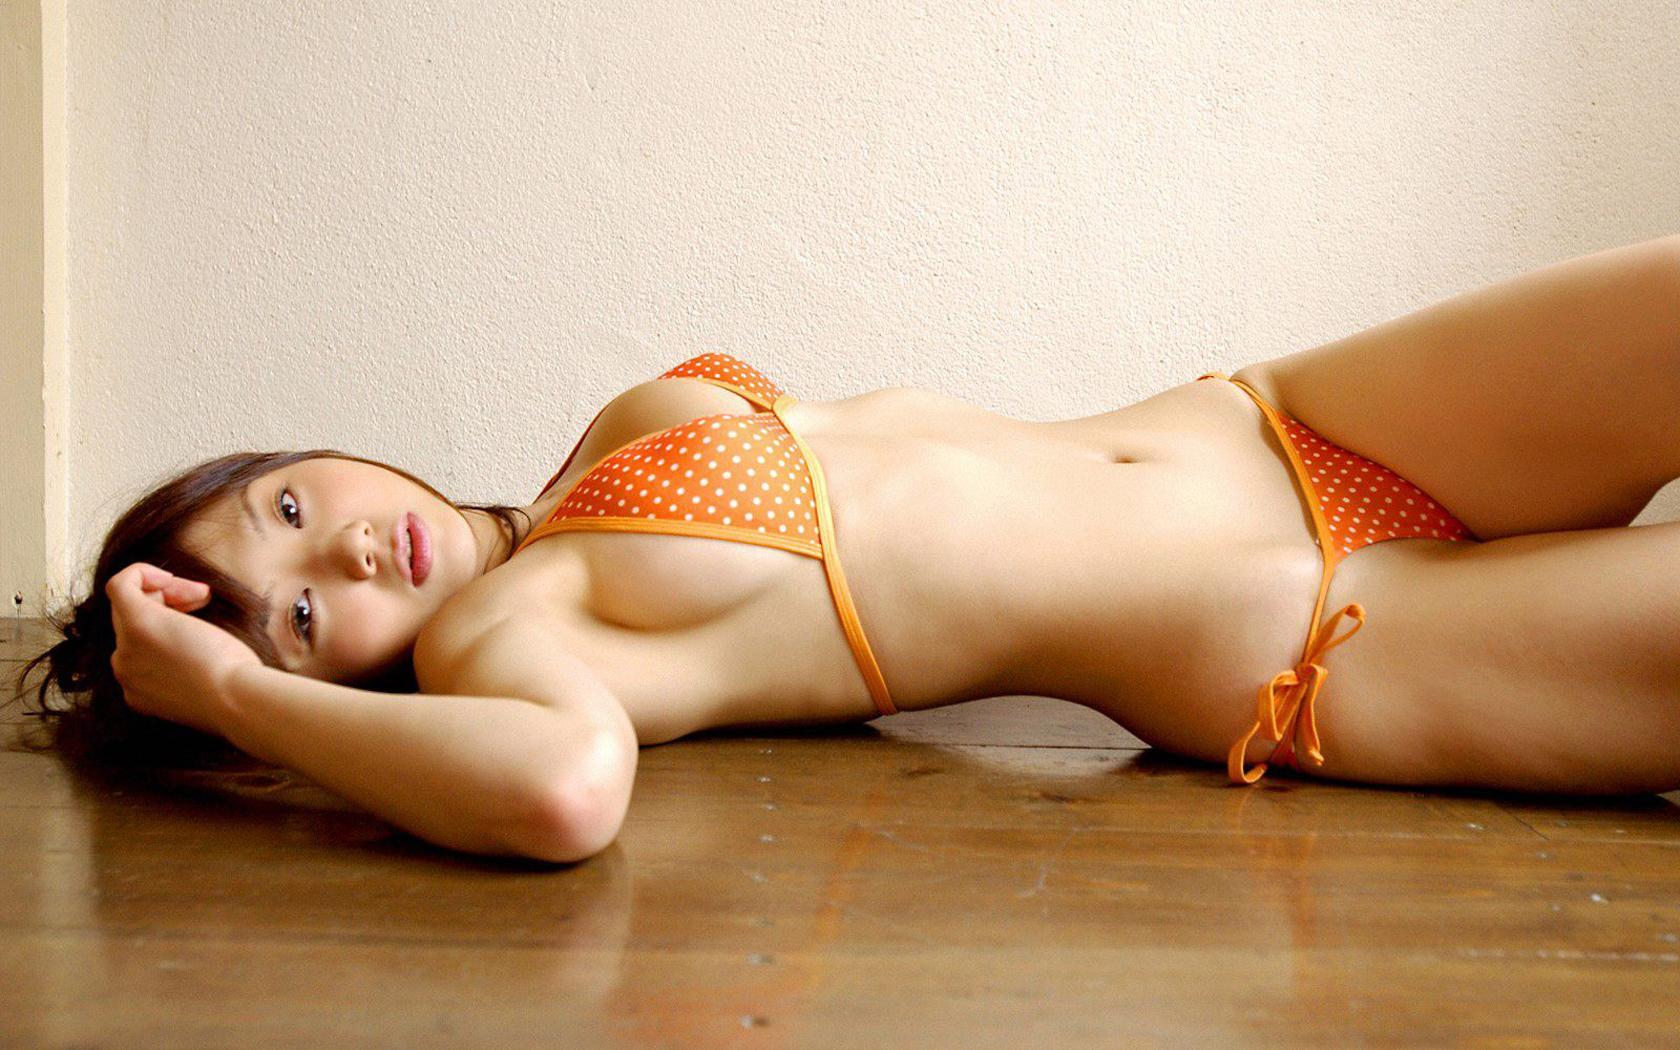 naturist young nudist